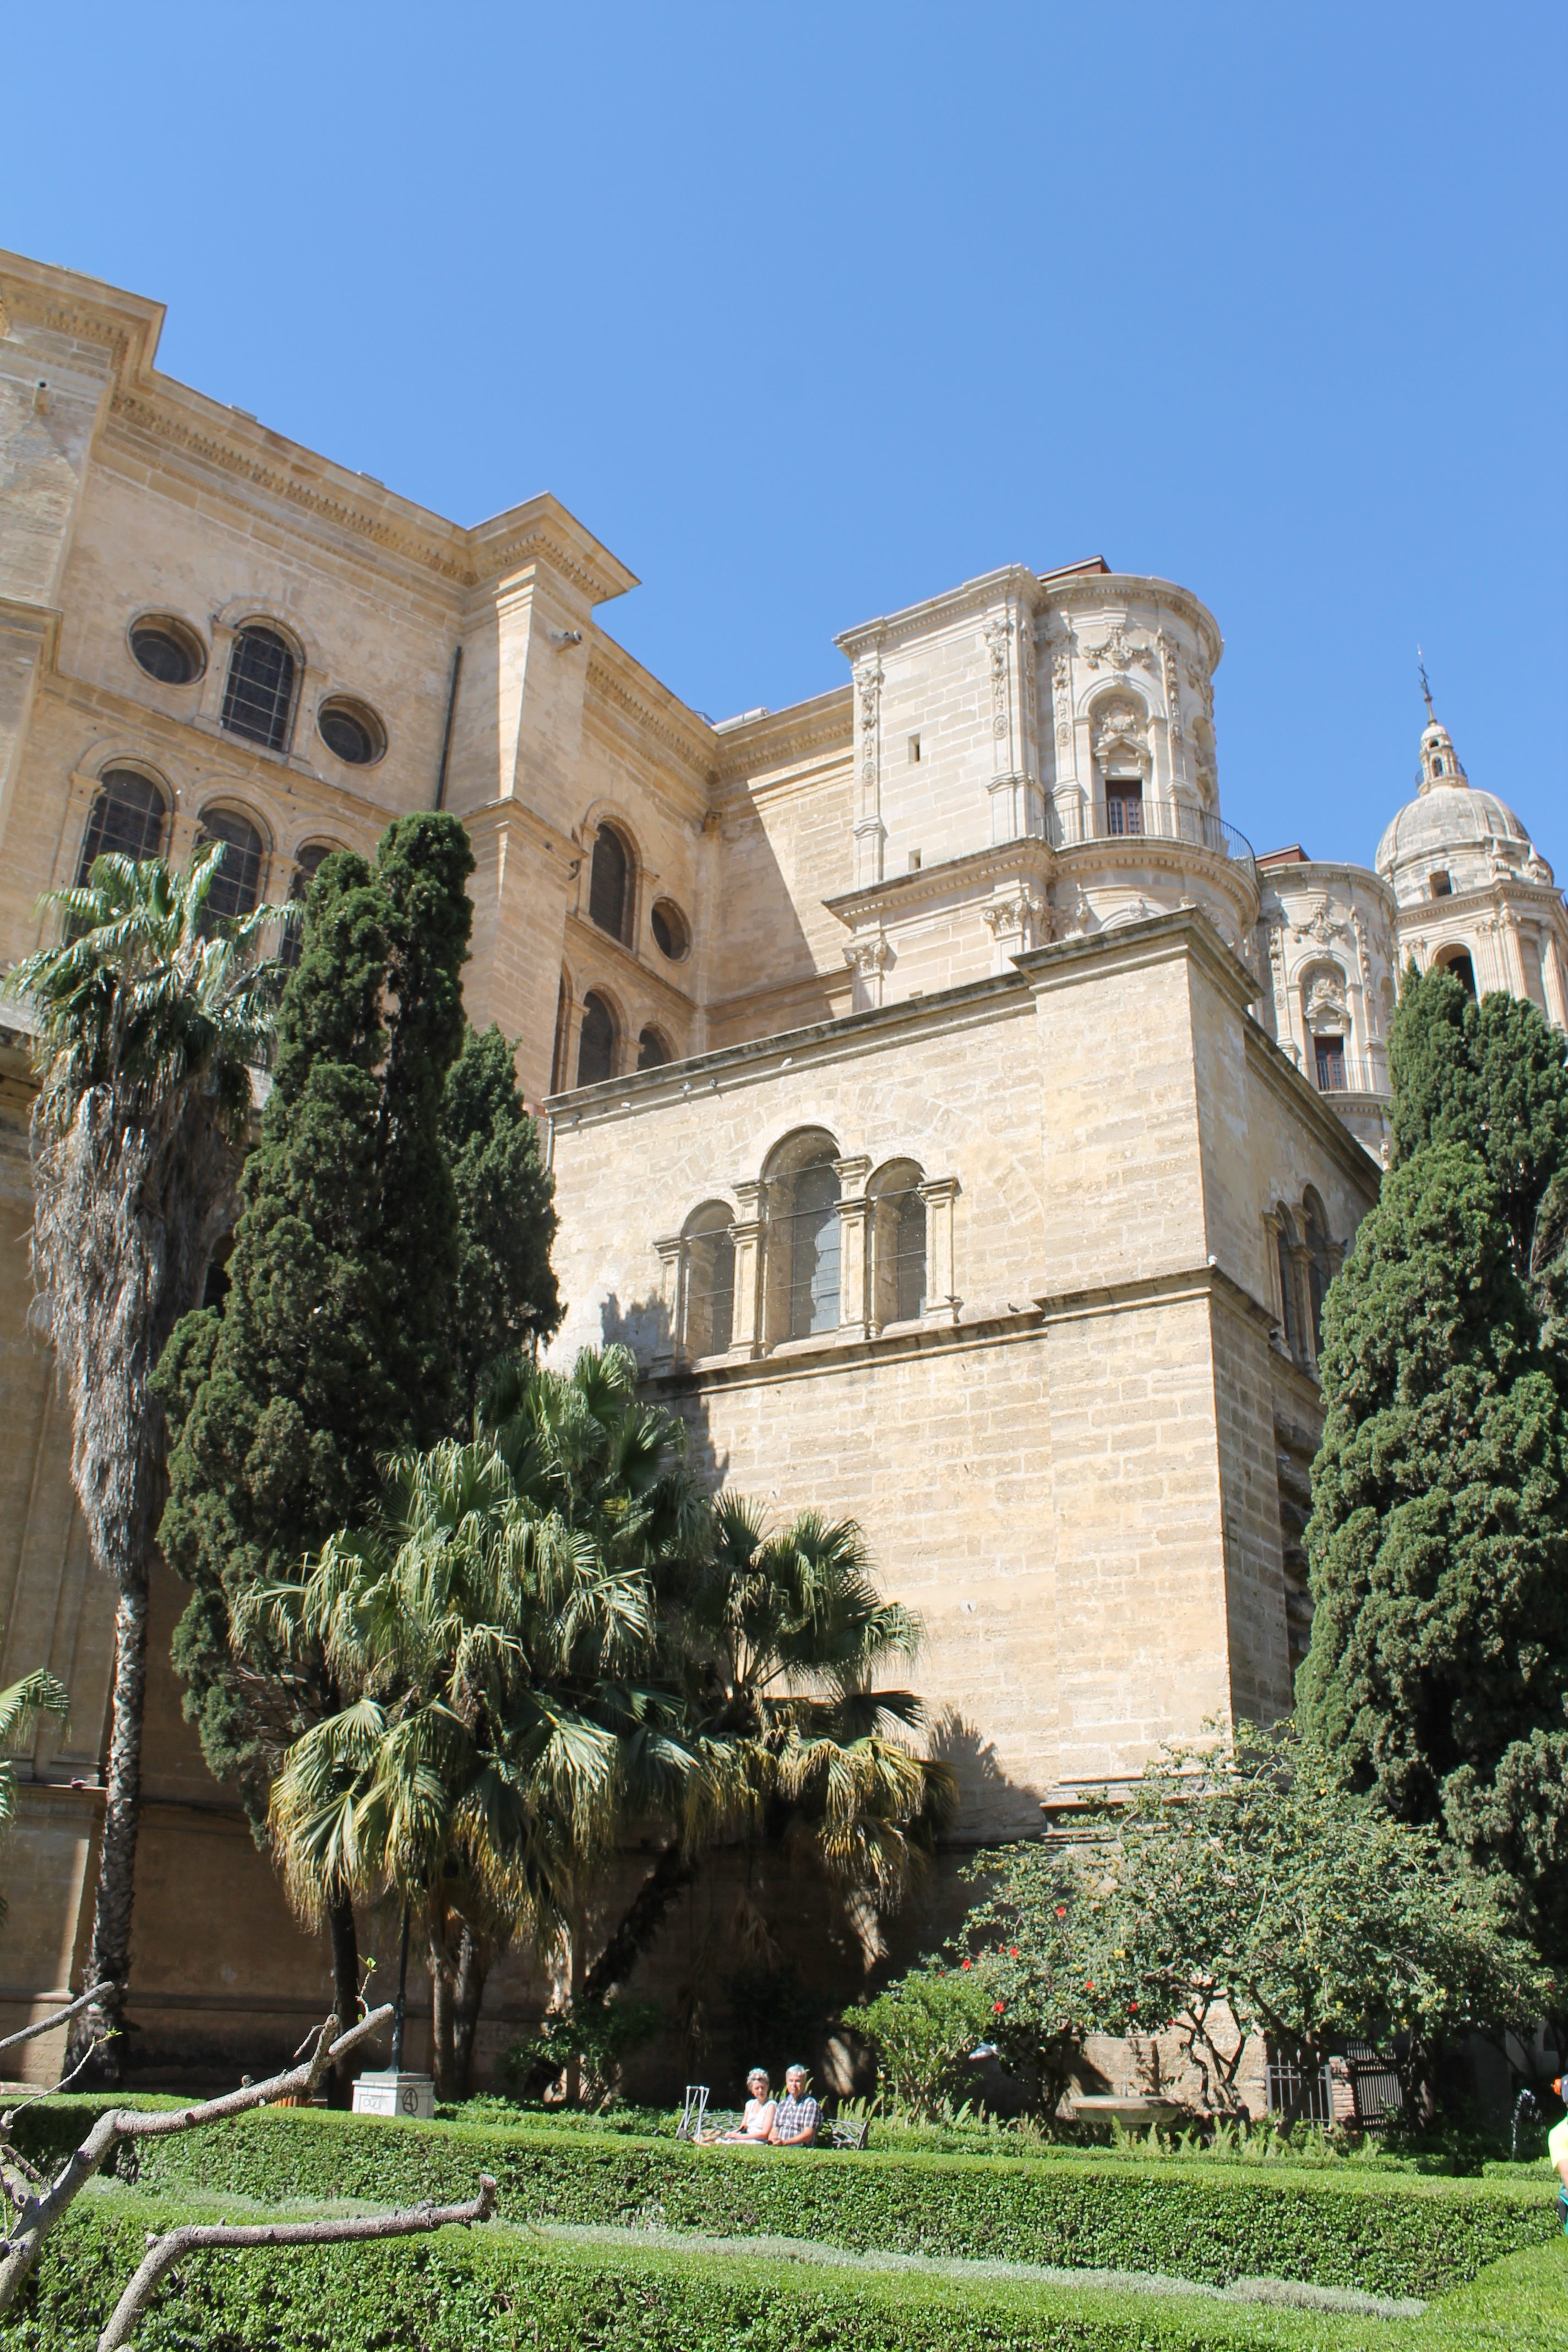 Katedralen i Malaga